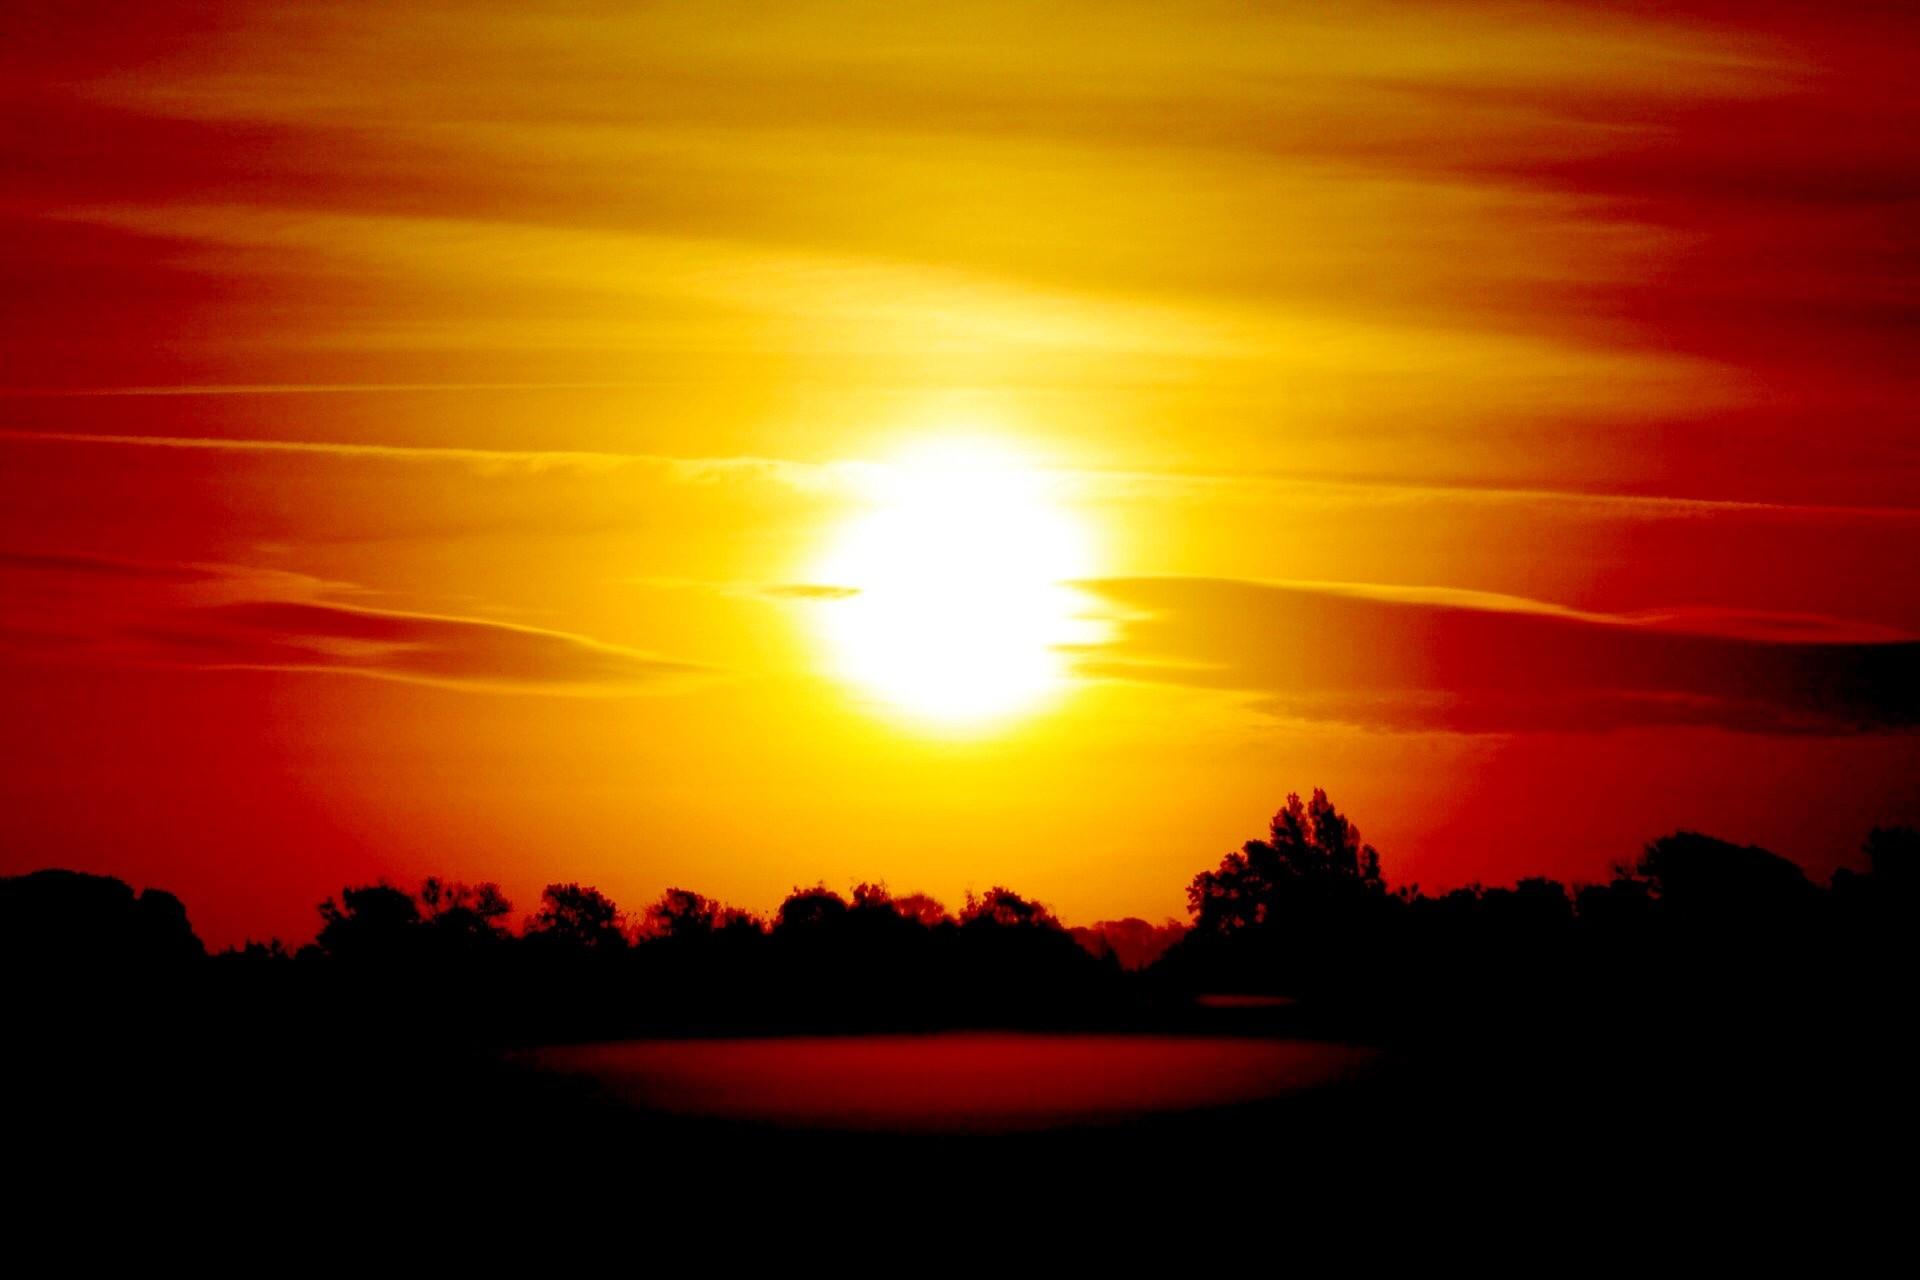 horizon cloud sky sun sunrise sunset sunlight morning dawn atmosphere  summer dusk evening scenic background beautiful